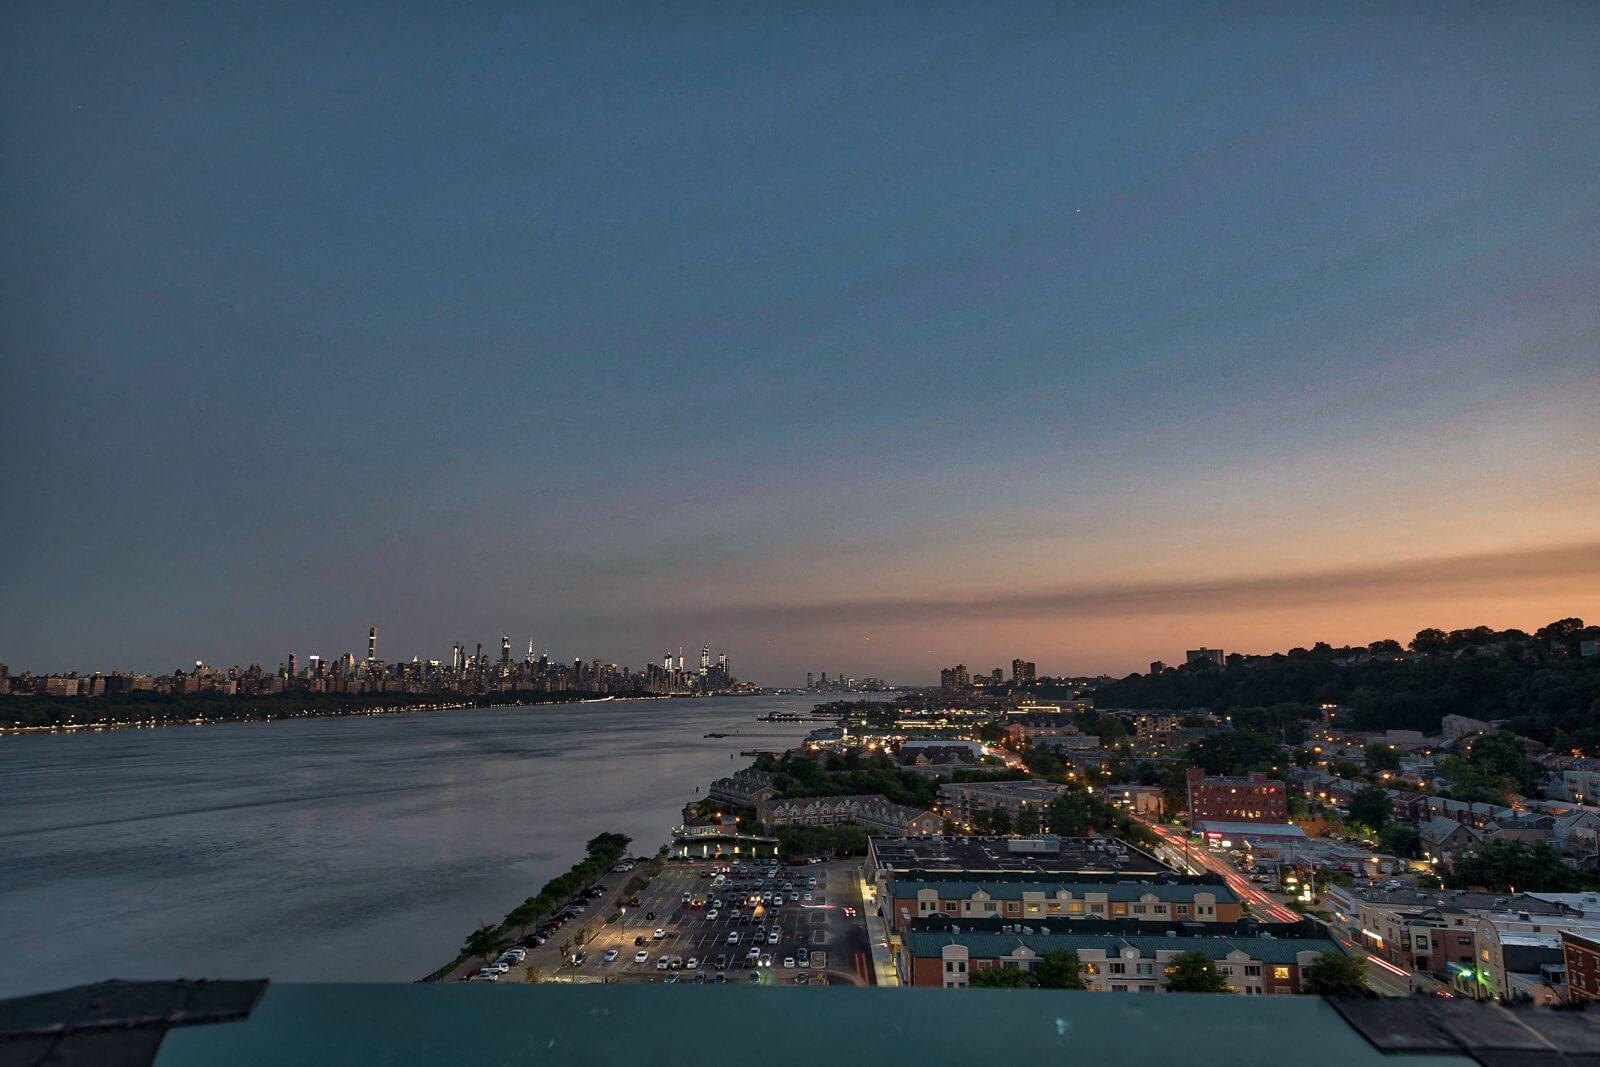 NYC Skyline View at Windsor at Mariners, 07020, NJ